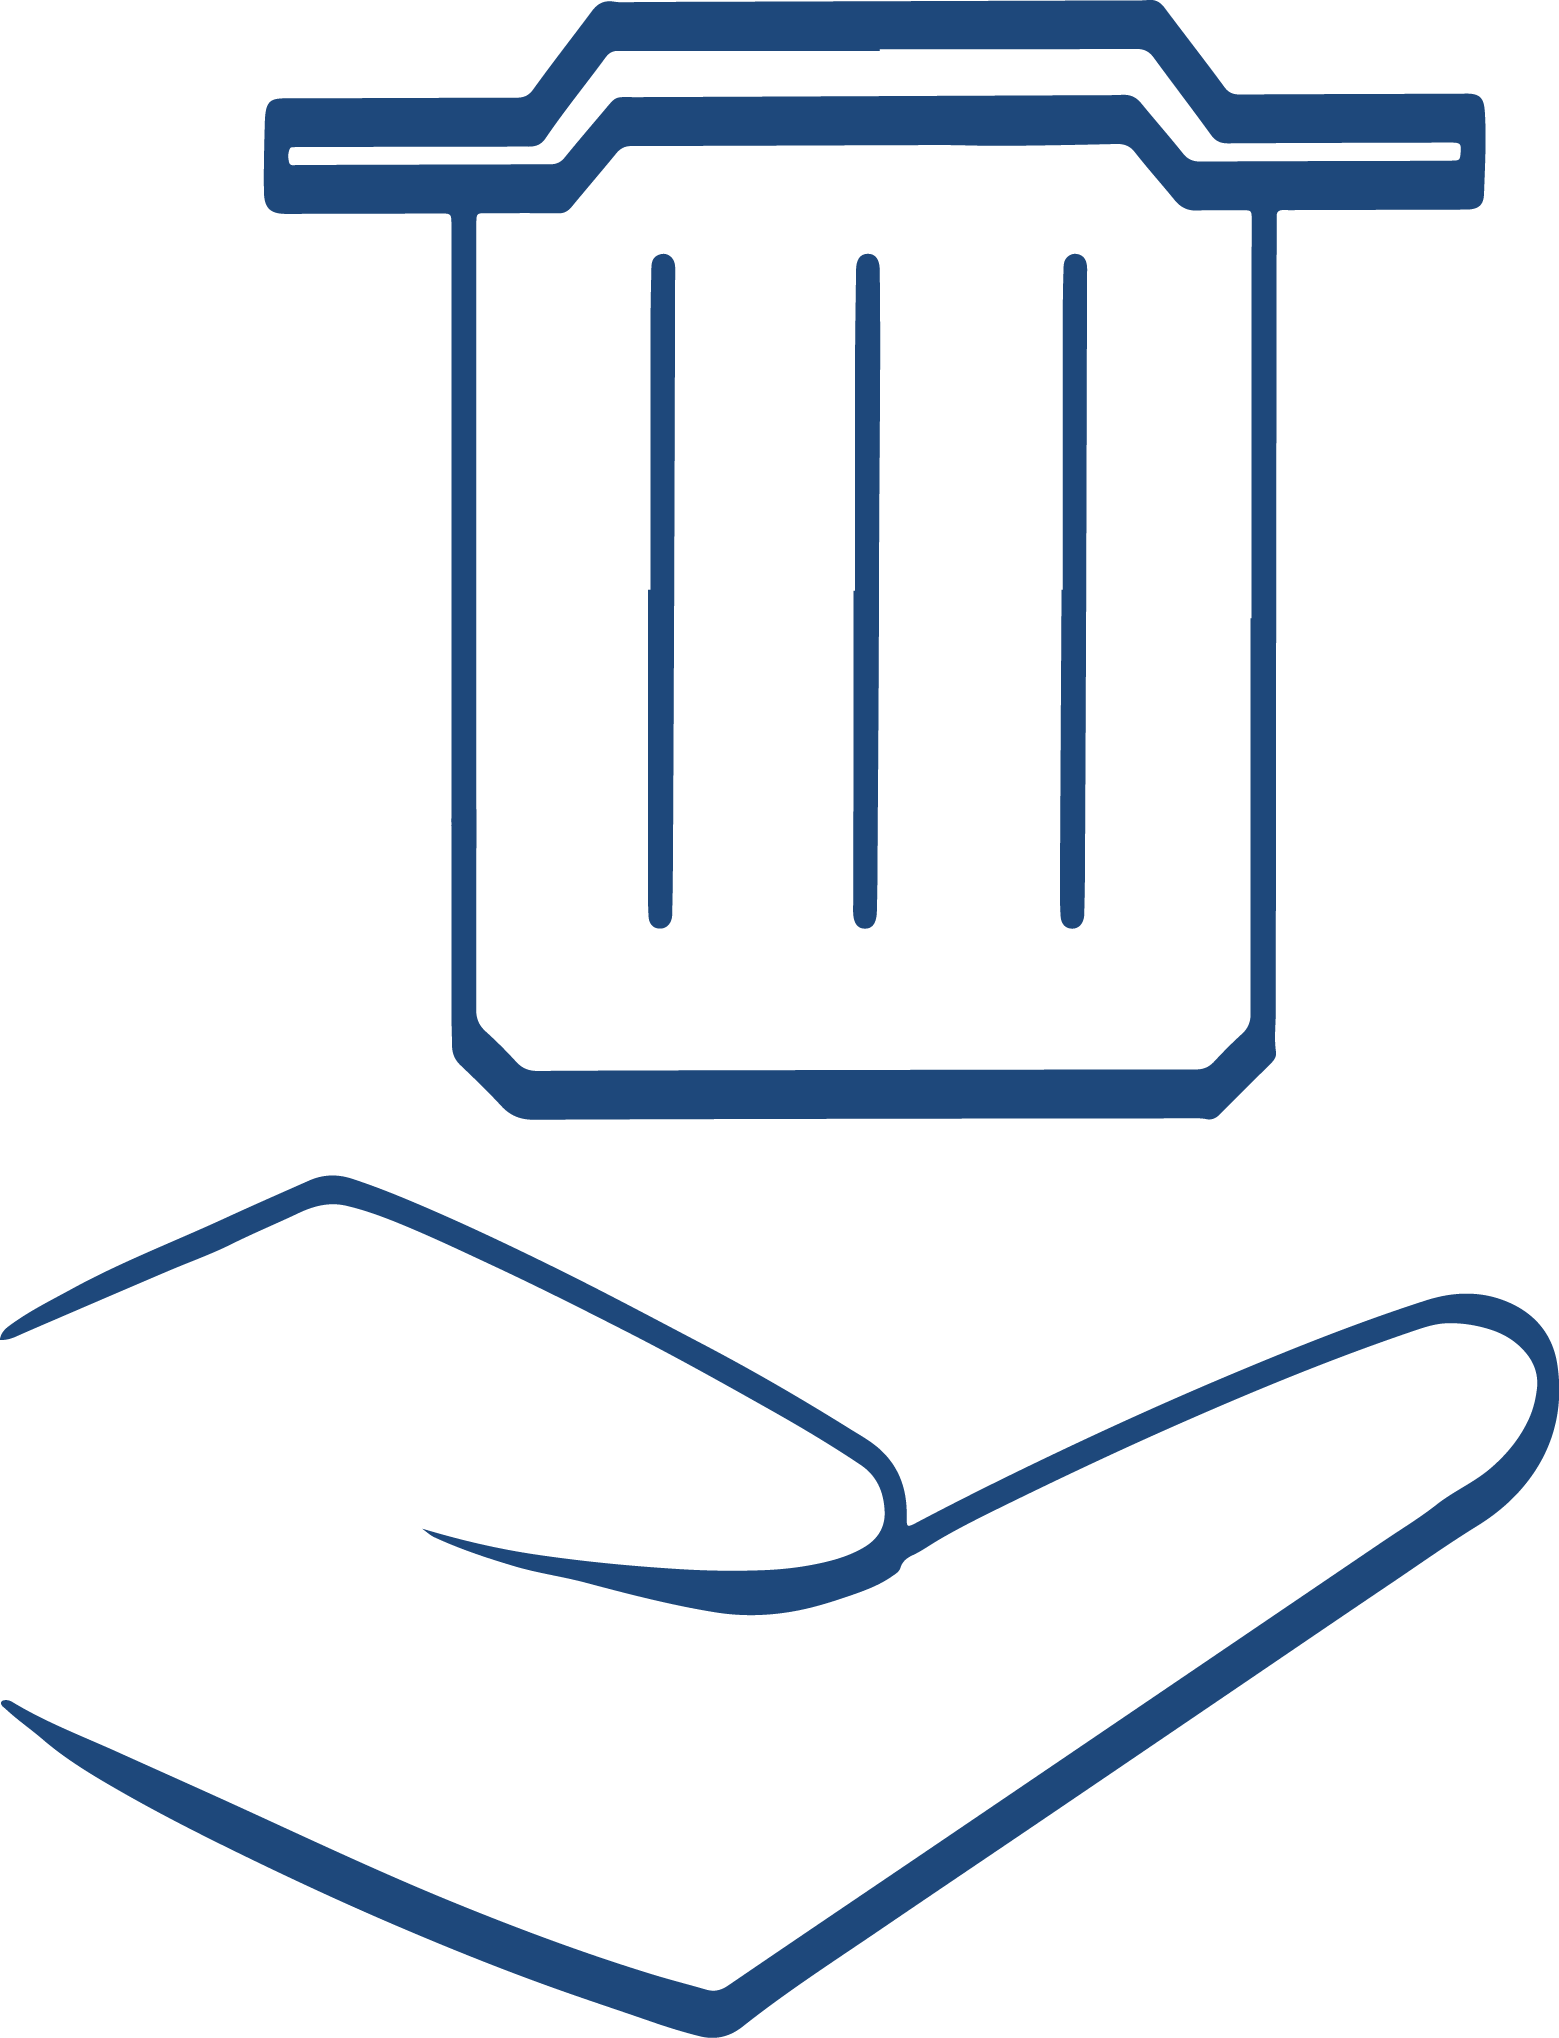 Right to erasure icon